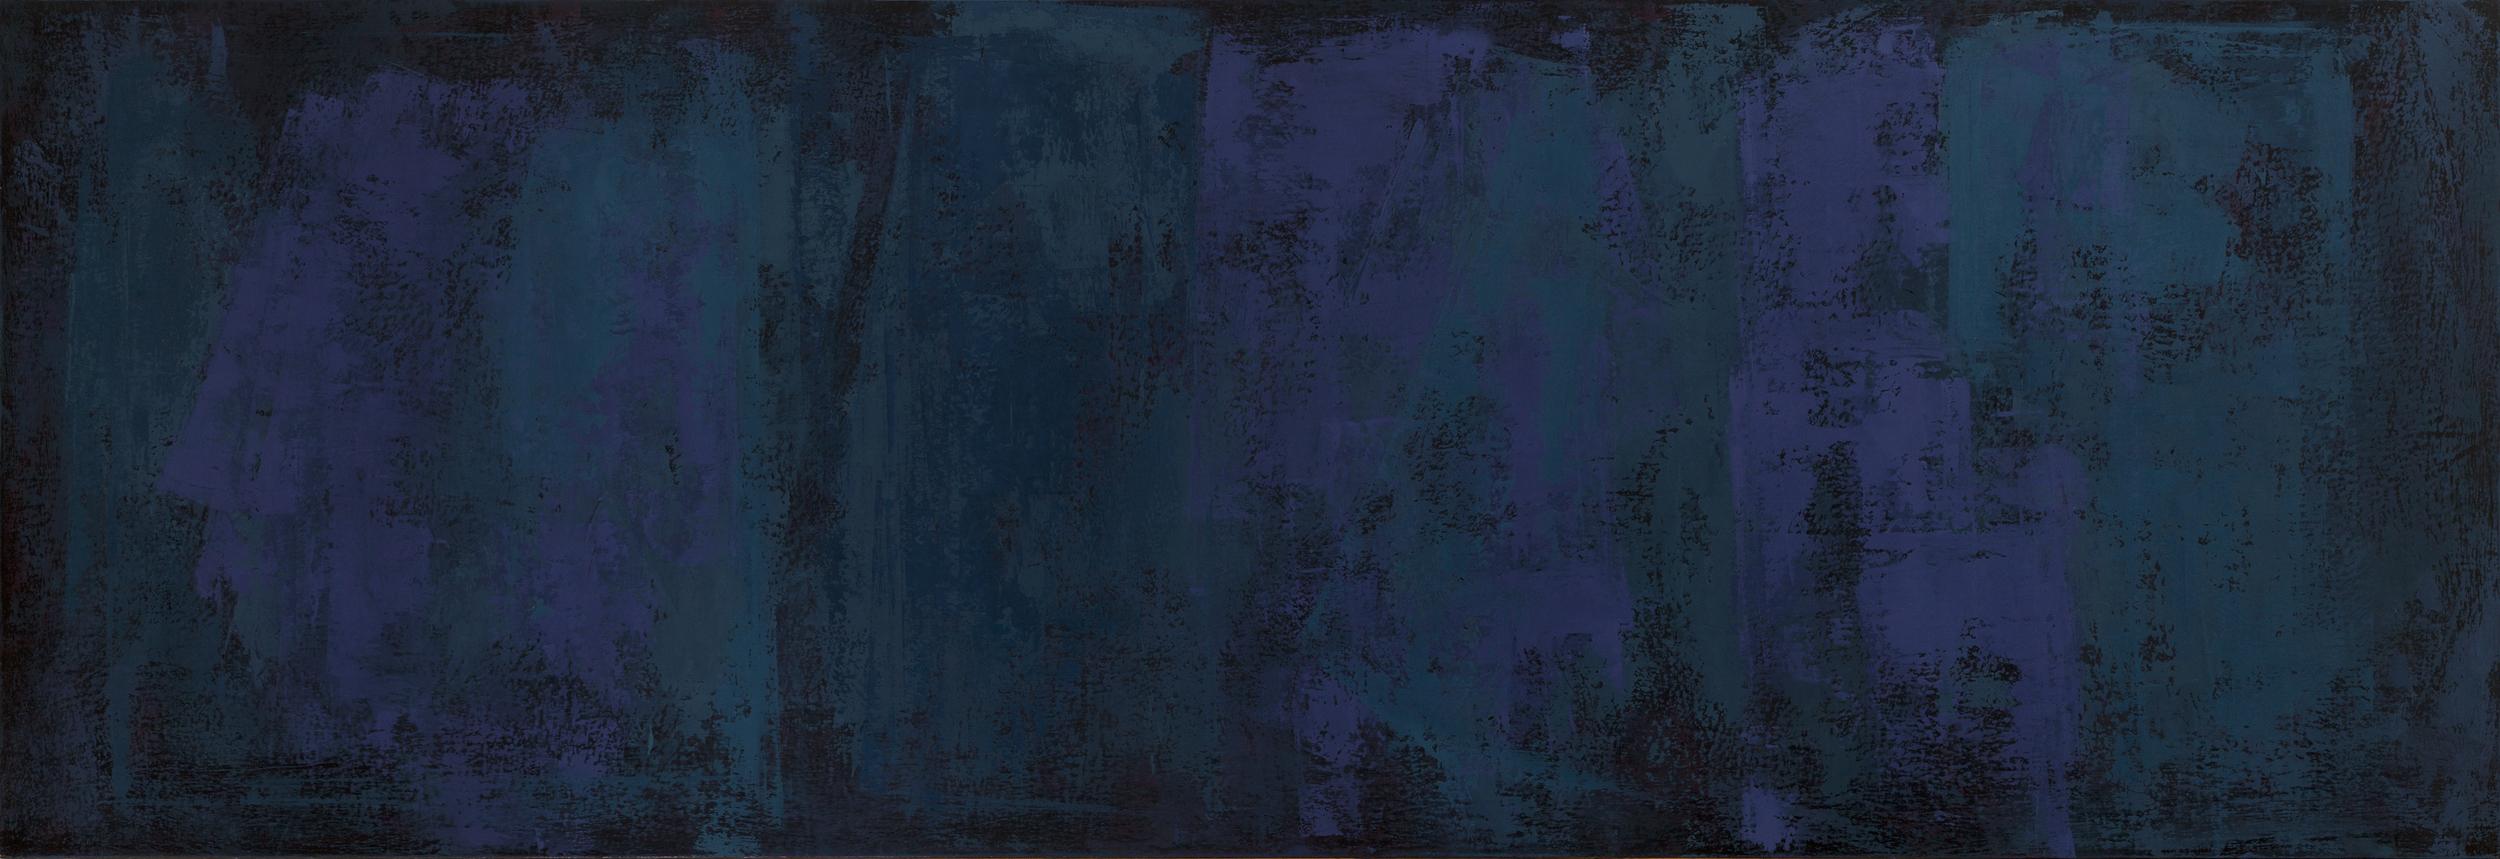 UNTITLED NARRATIVE #2 (5) (2500X300)